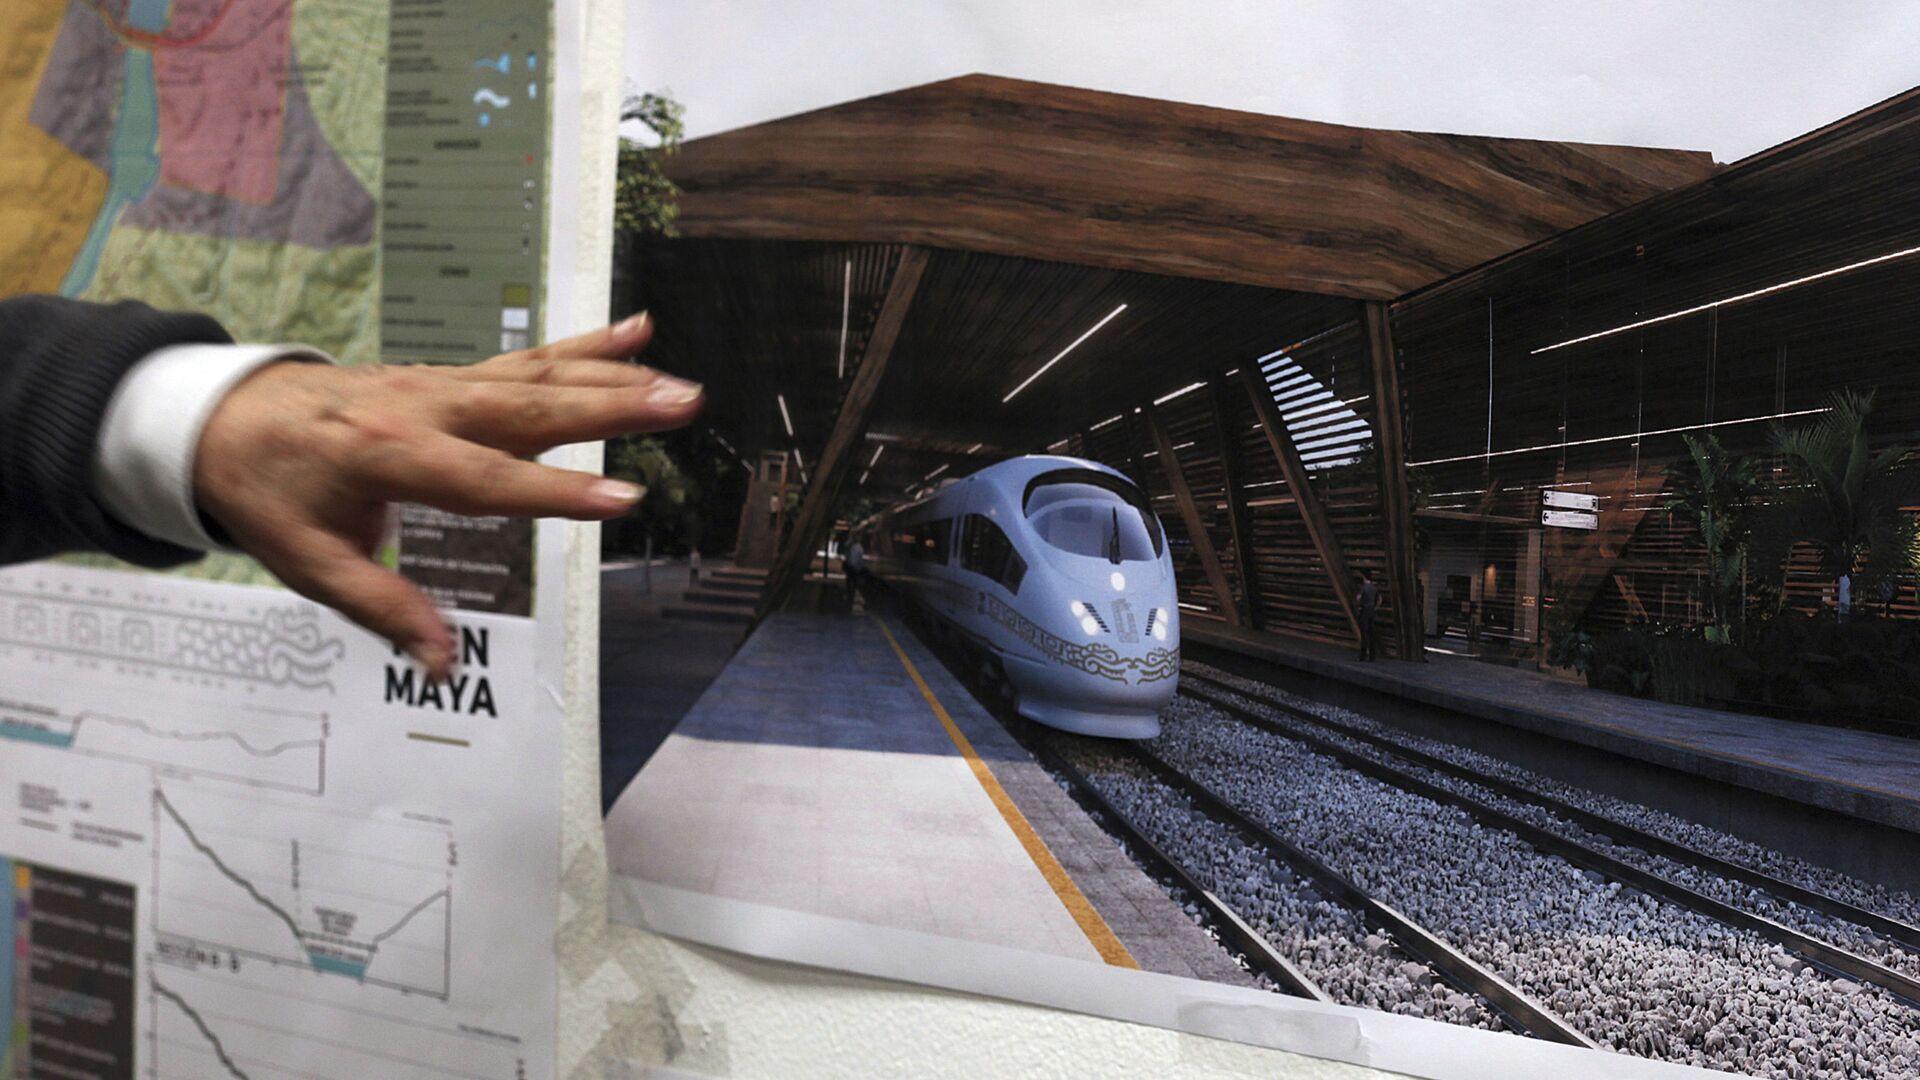 El plan de construcciones del Tren Maya - Sputnik Mundo, 1920, 30.09.2021